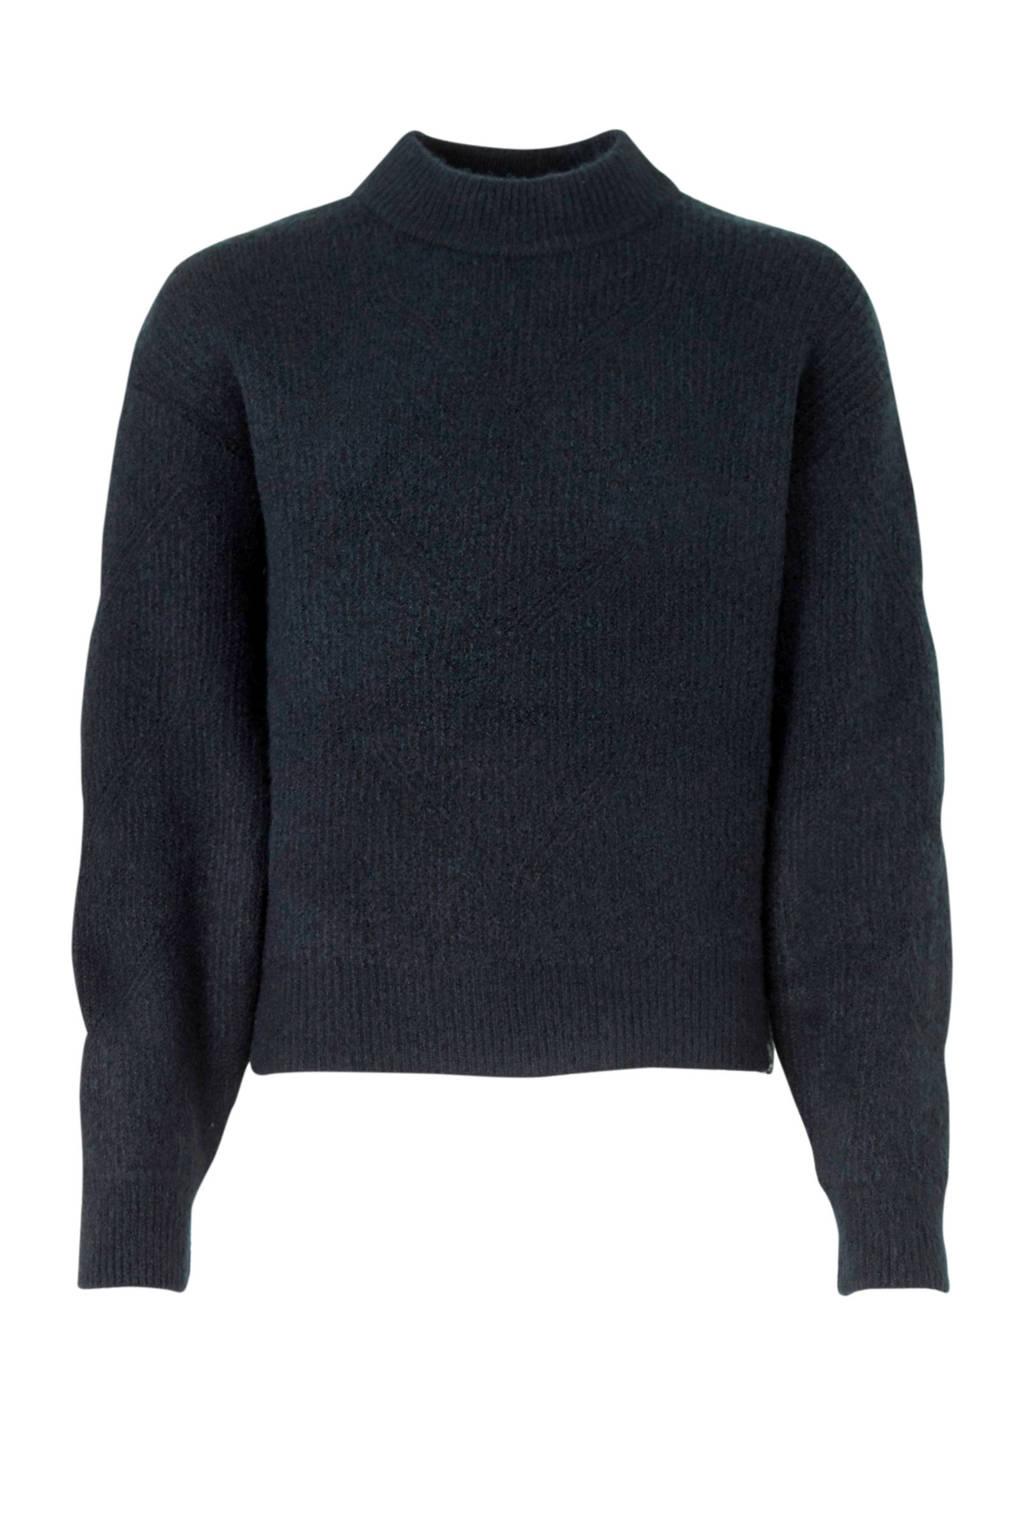 Garcia sweater met col donkerblauw, Donkerblauw